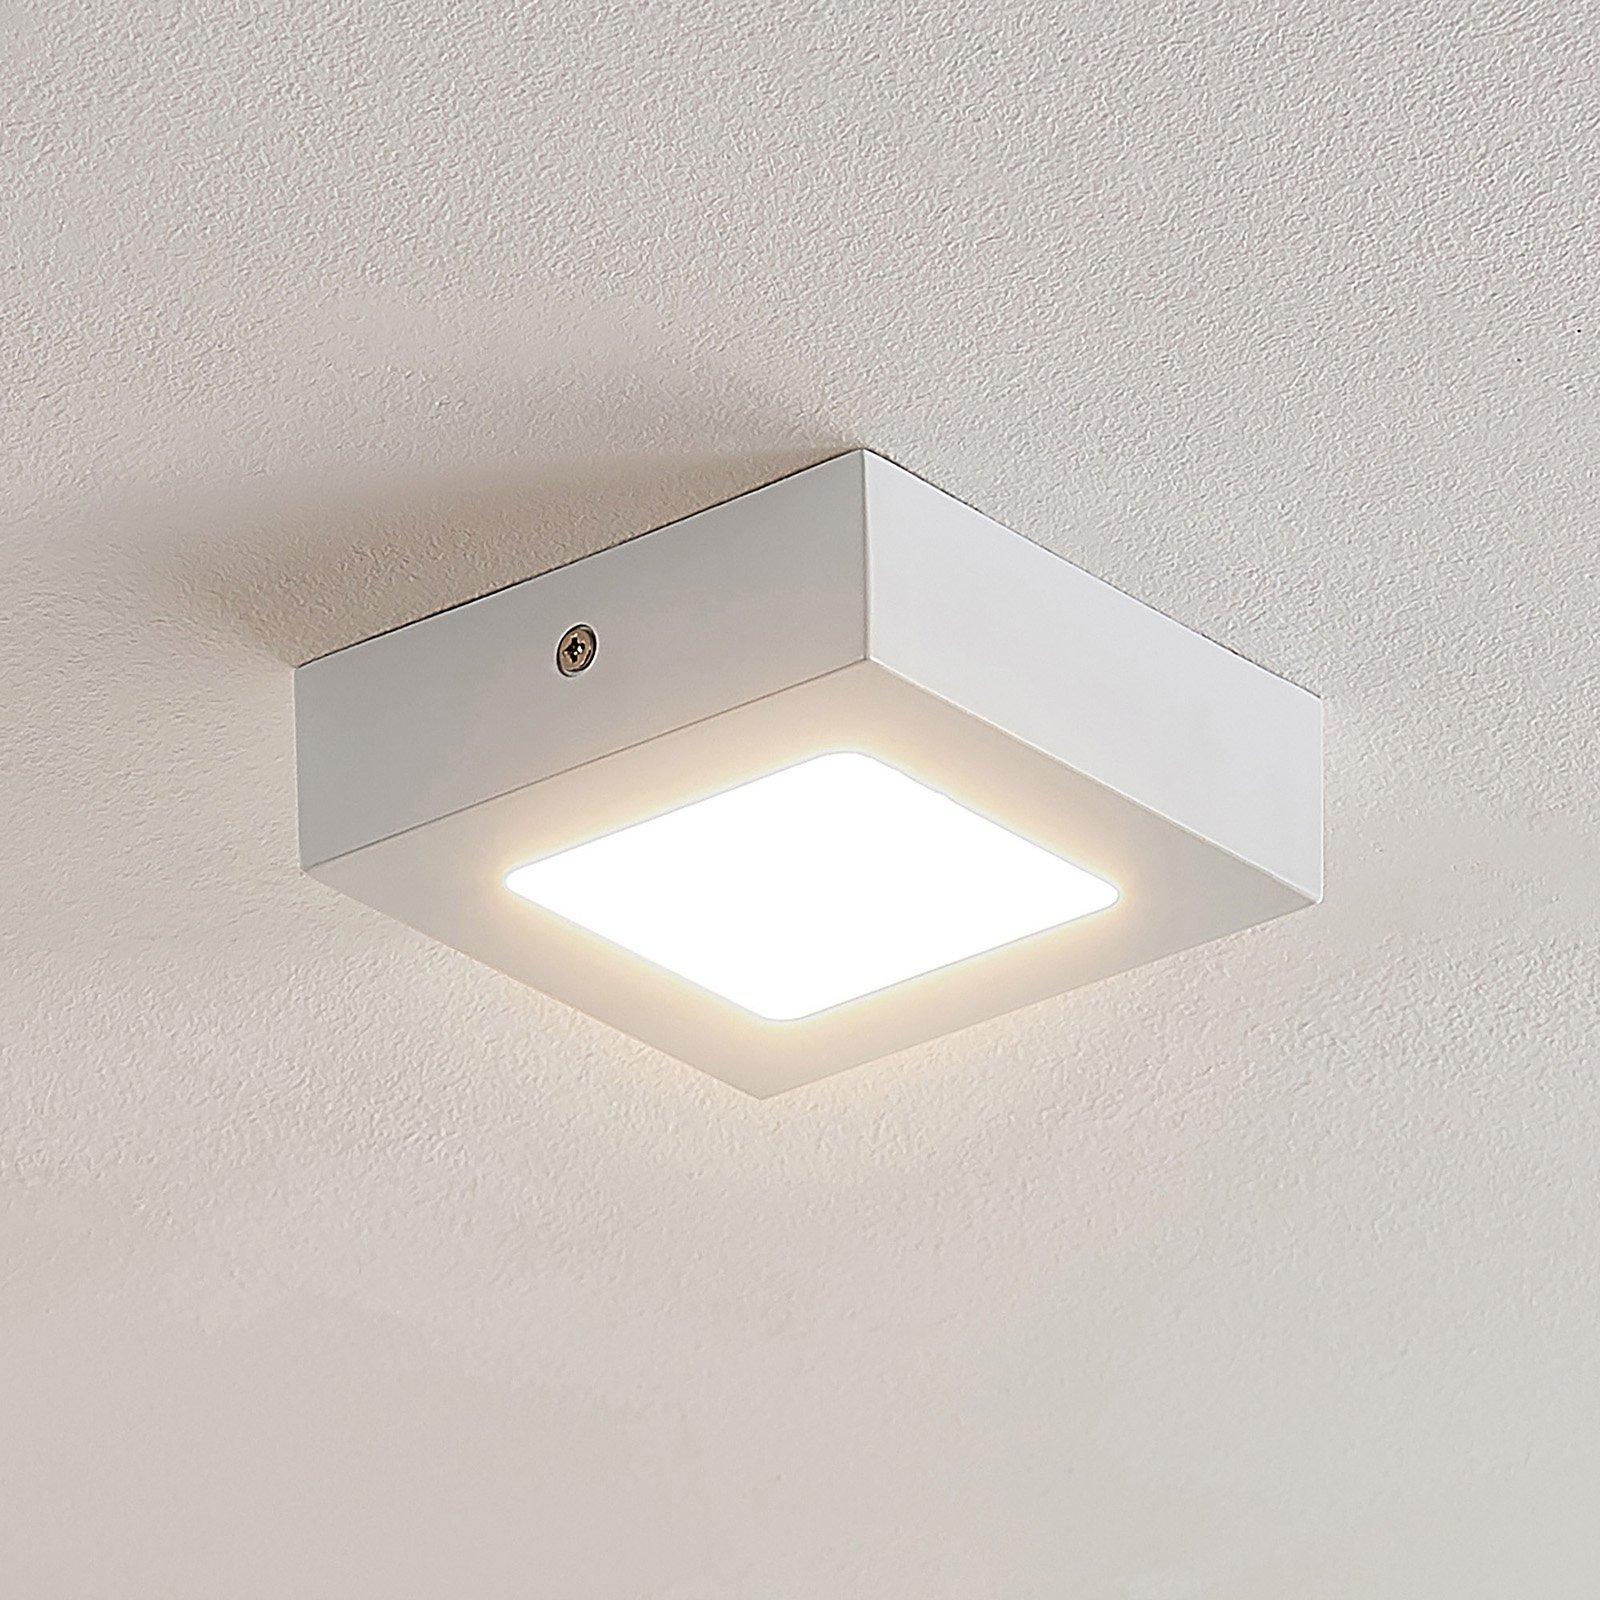 ELC Merina LED-downlight, hvit 12x12